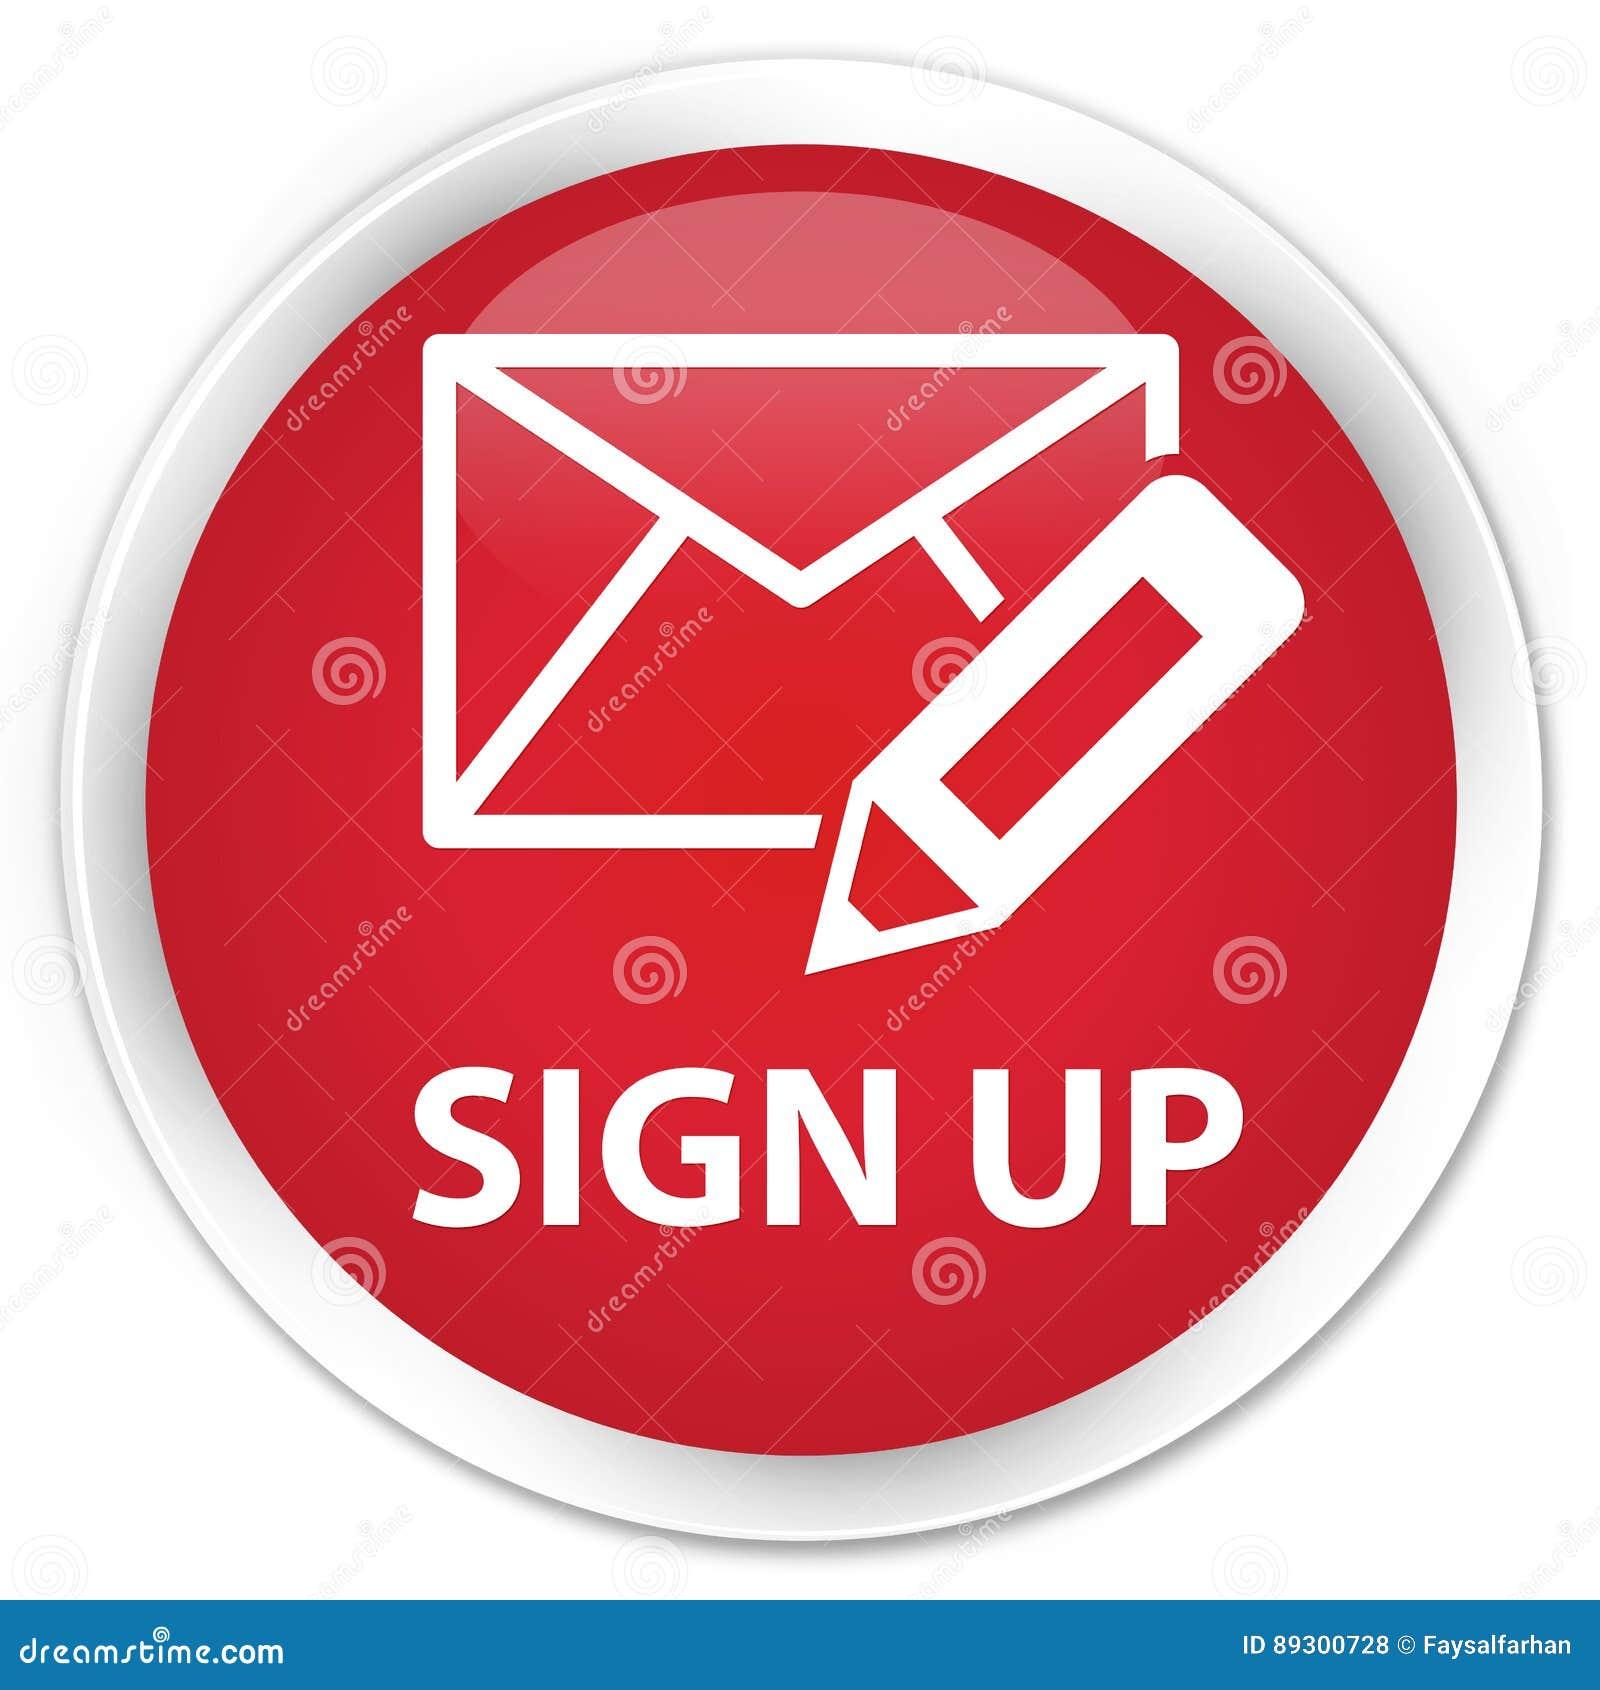 Sign up (edit mail icon) premium red round button